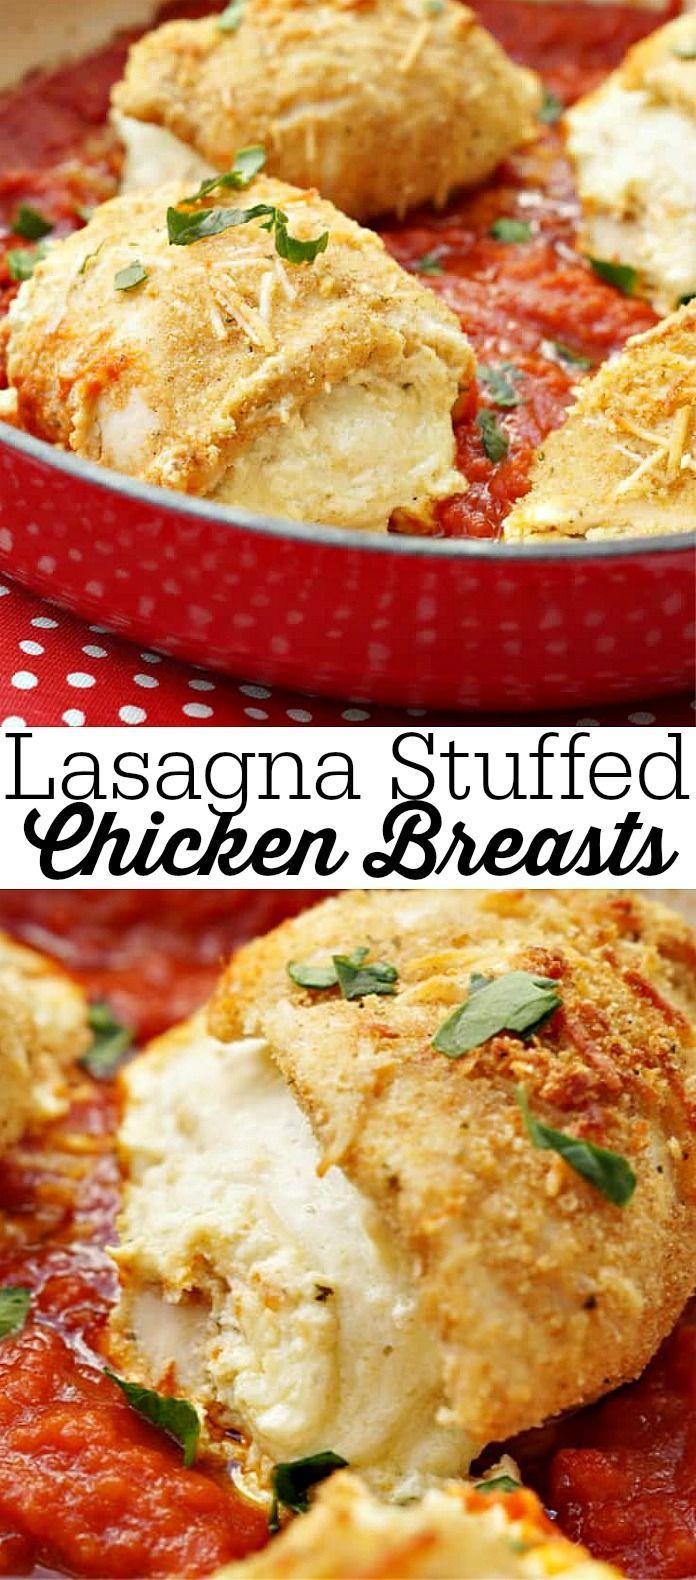 Lasagna Stuffed Chicken Breasts Lasagna Stuffed Chicken Breasts        Easy One Pot Dinner Recipe, Lasagna Stuffed Chicken Breasts